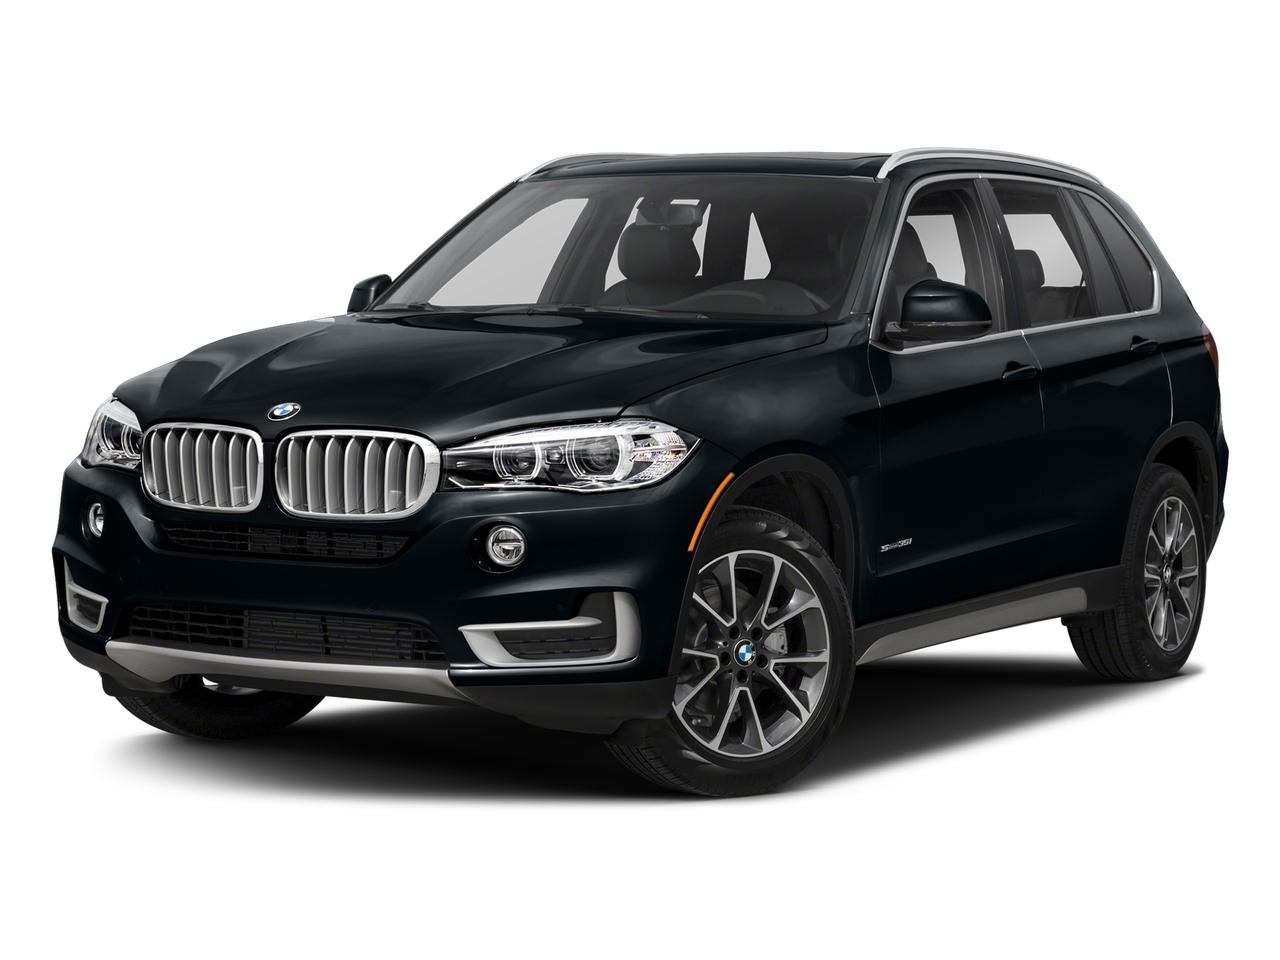 2018 BMW X5 xDrive35i Vehicle Photo in Tulsa, OK 74133